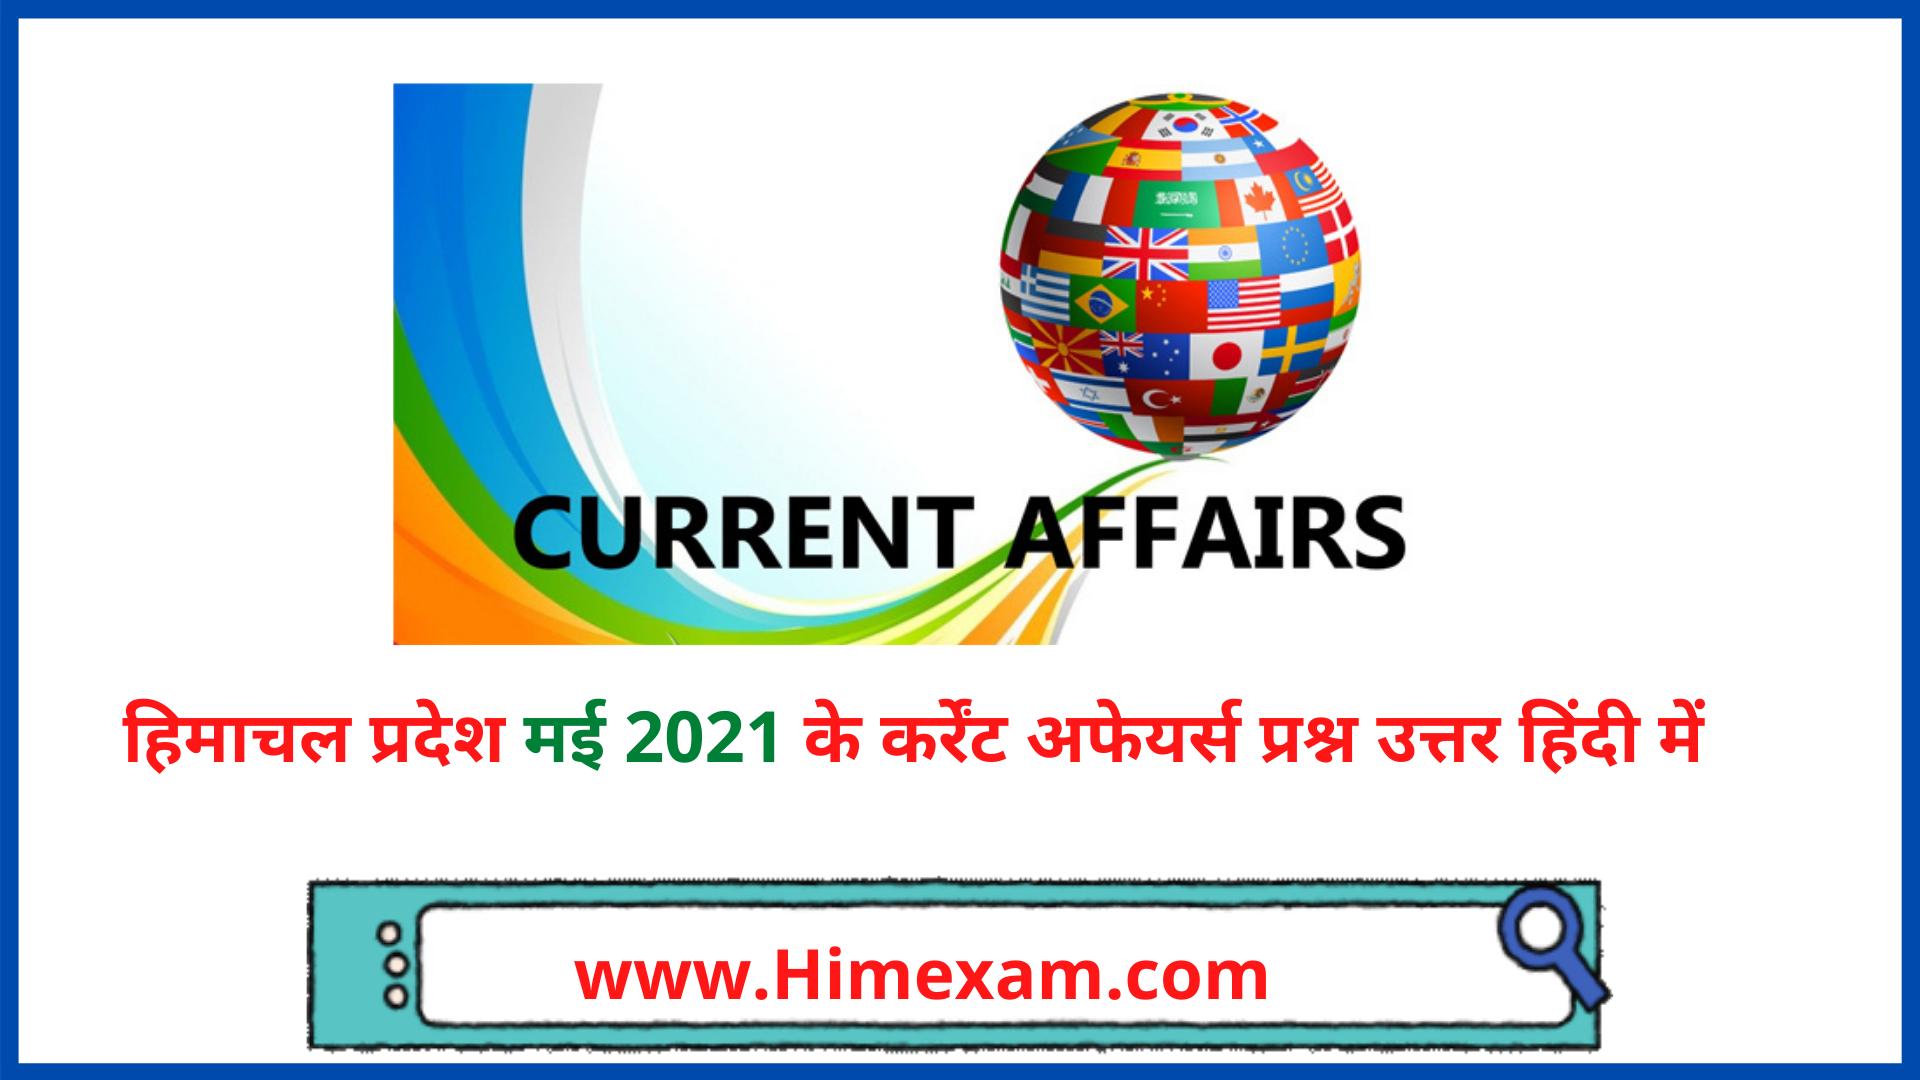 Himachal Pradesh May Month Current Affairs 2021